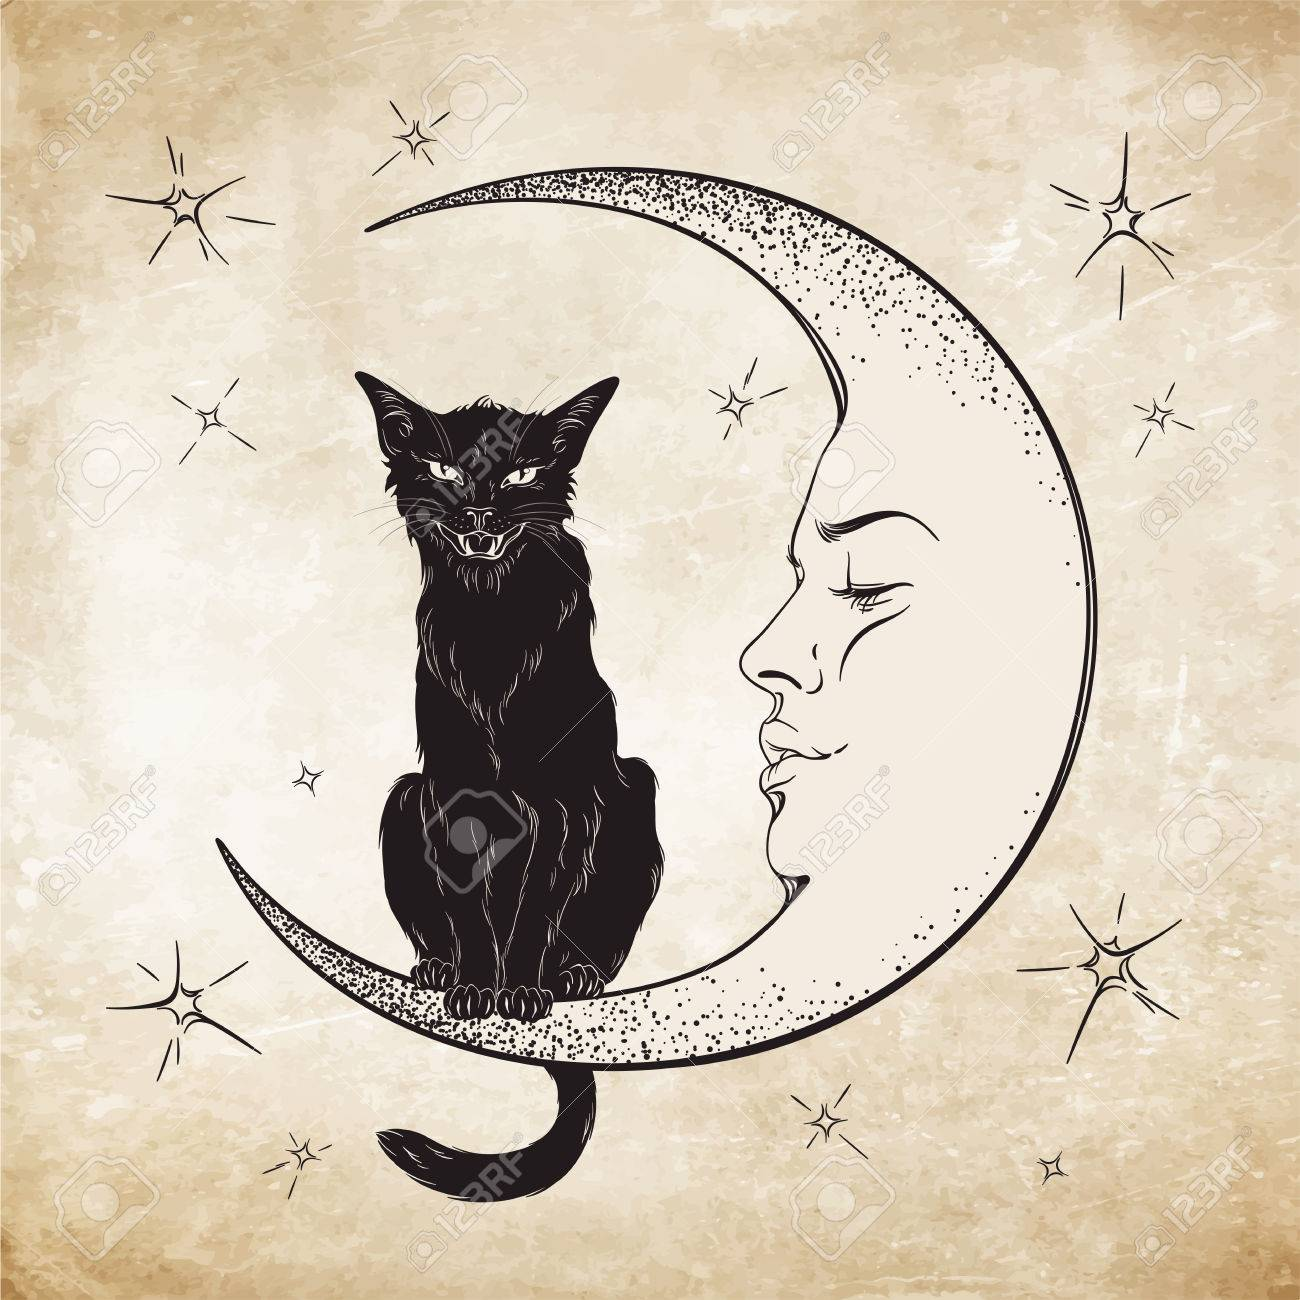 Black cat sitting on the moon. Wiccan familiar spirit vector illustration - 61784351